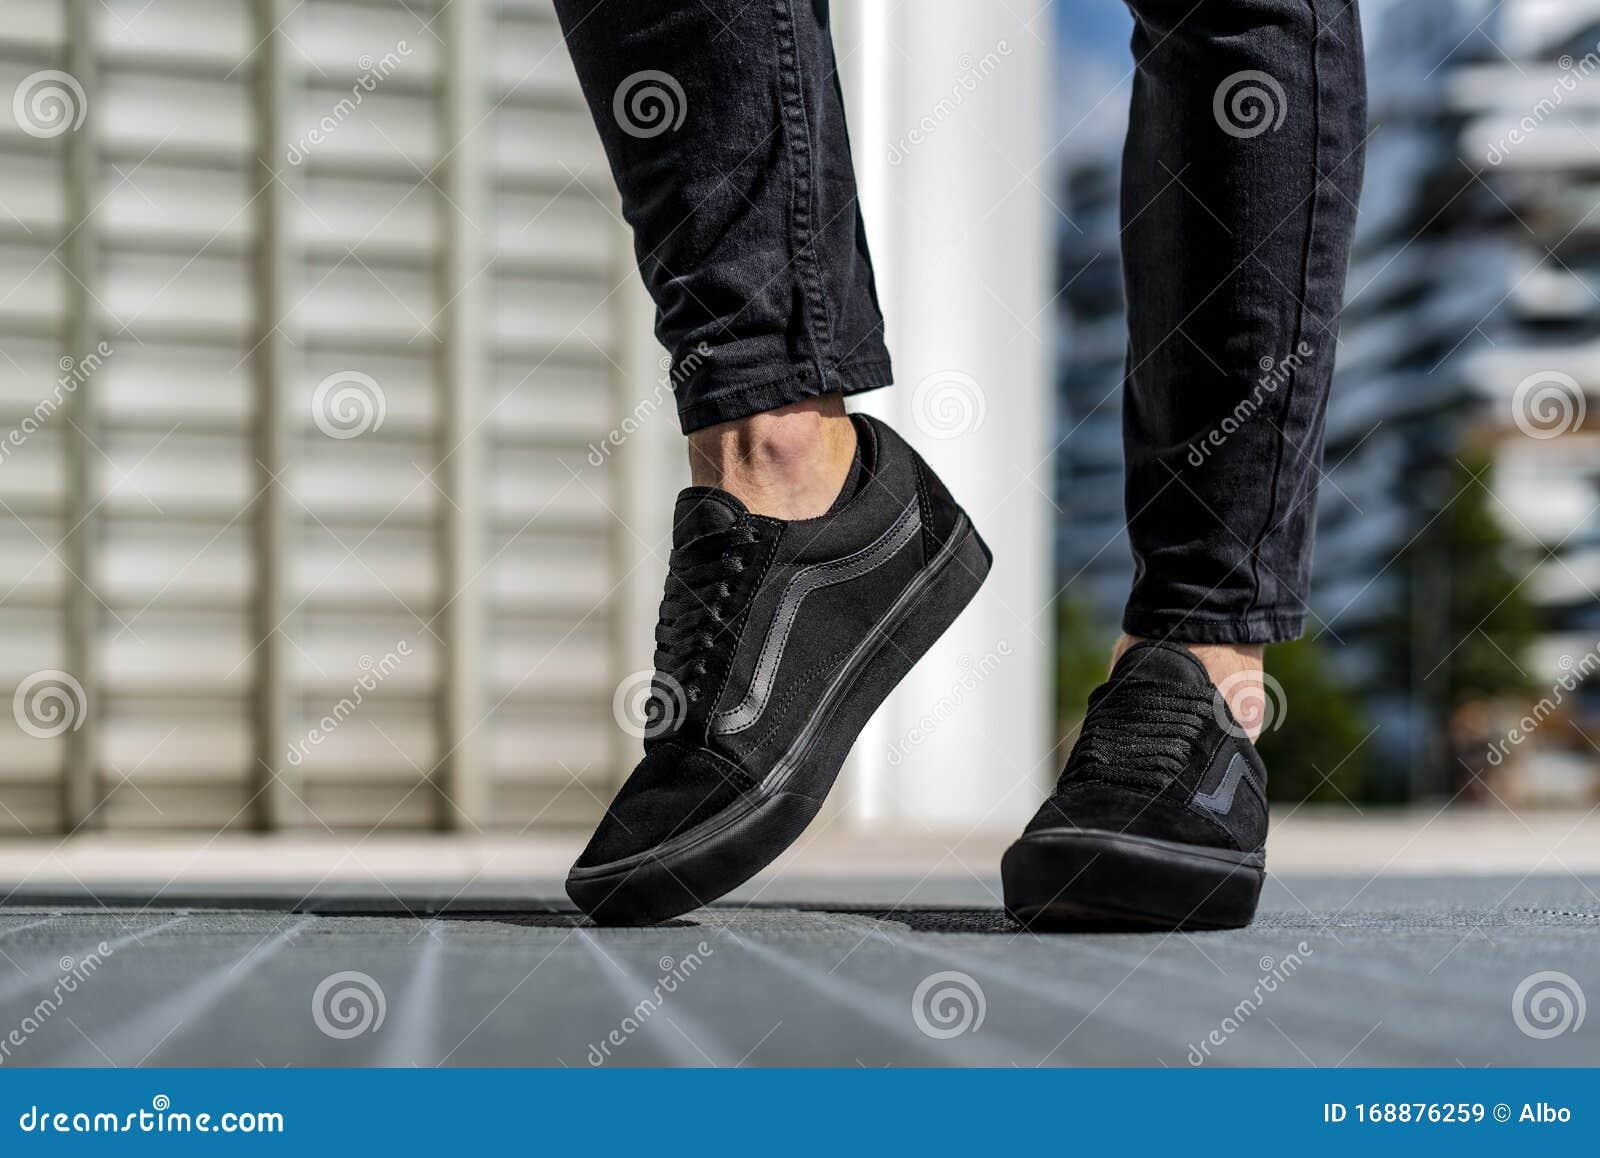 men wearing slip on vans